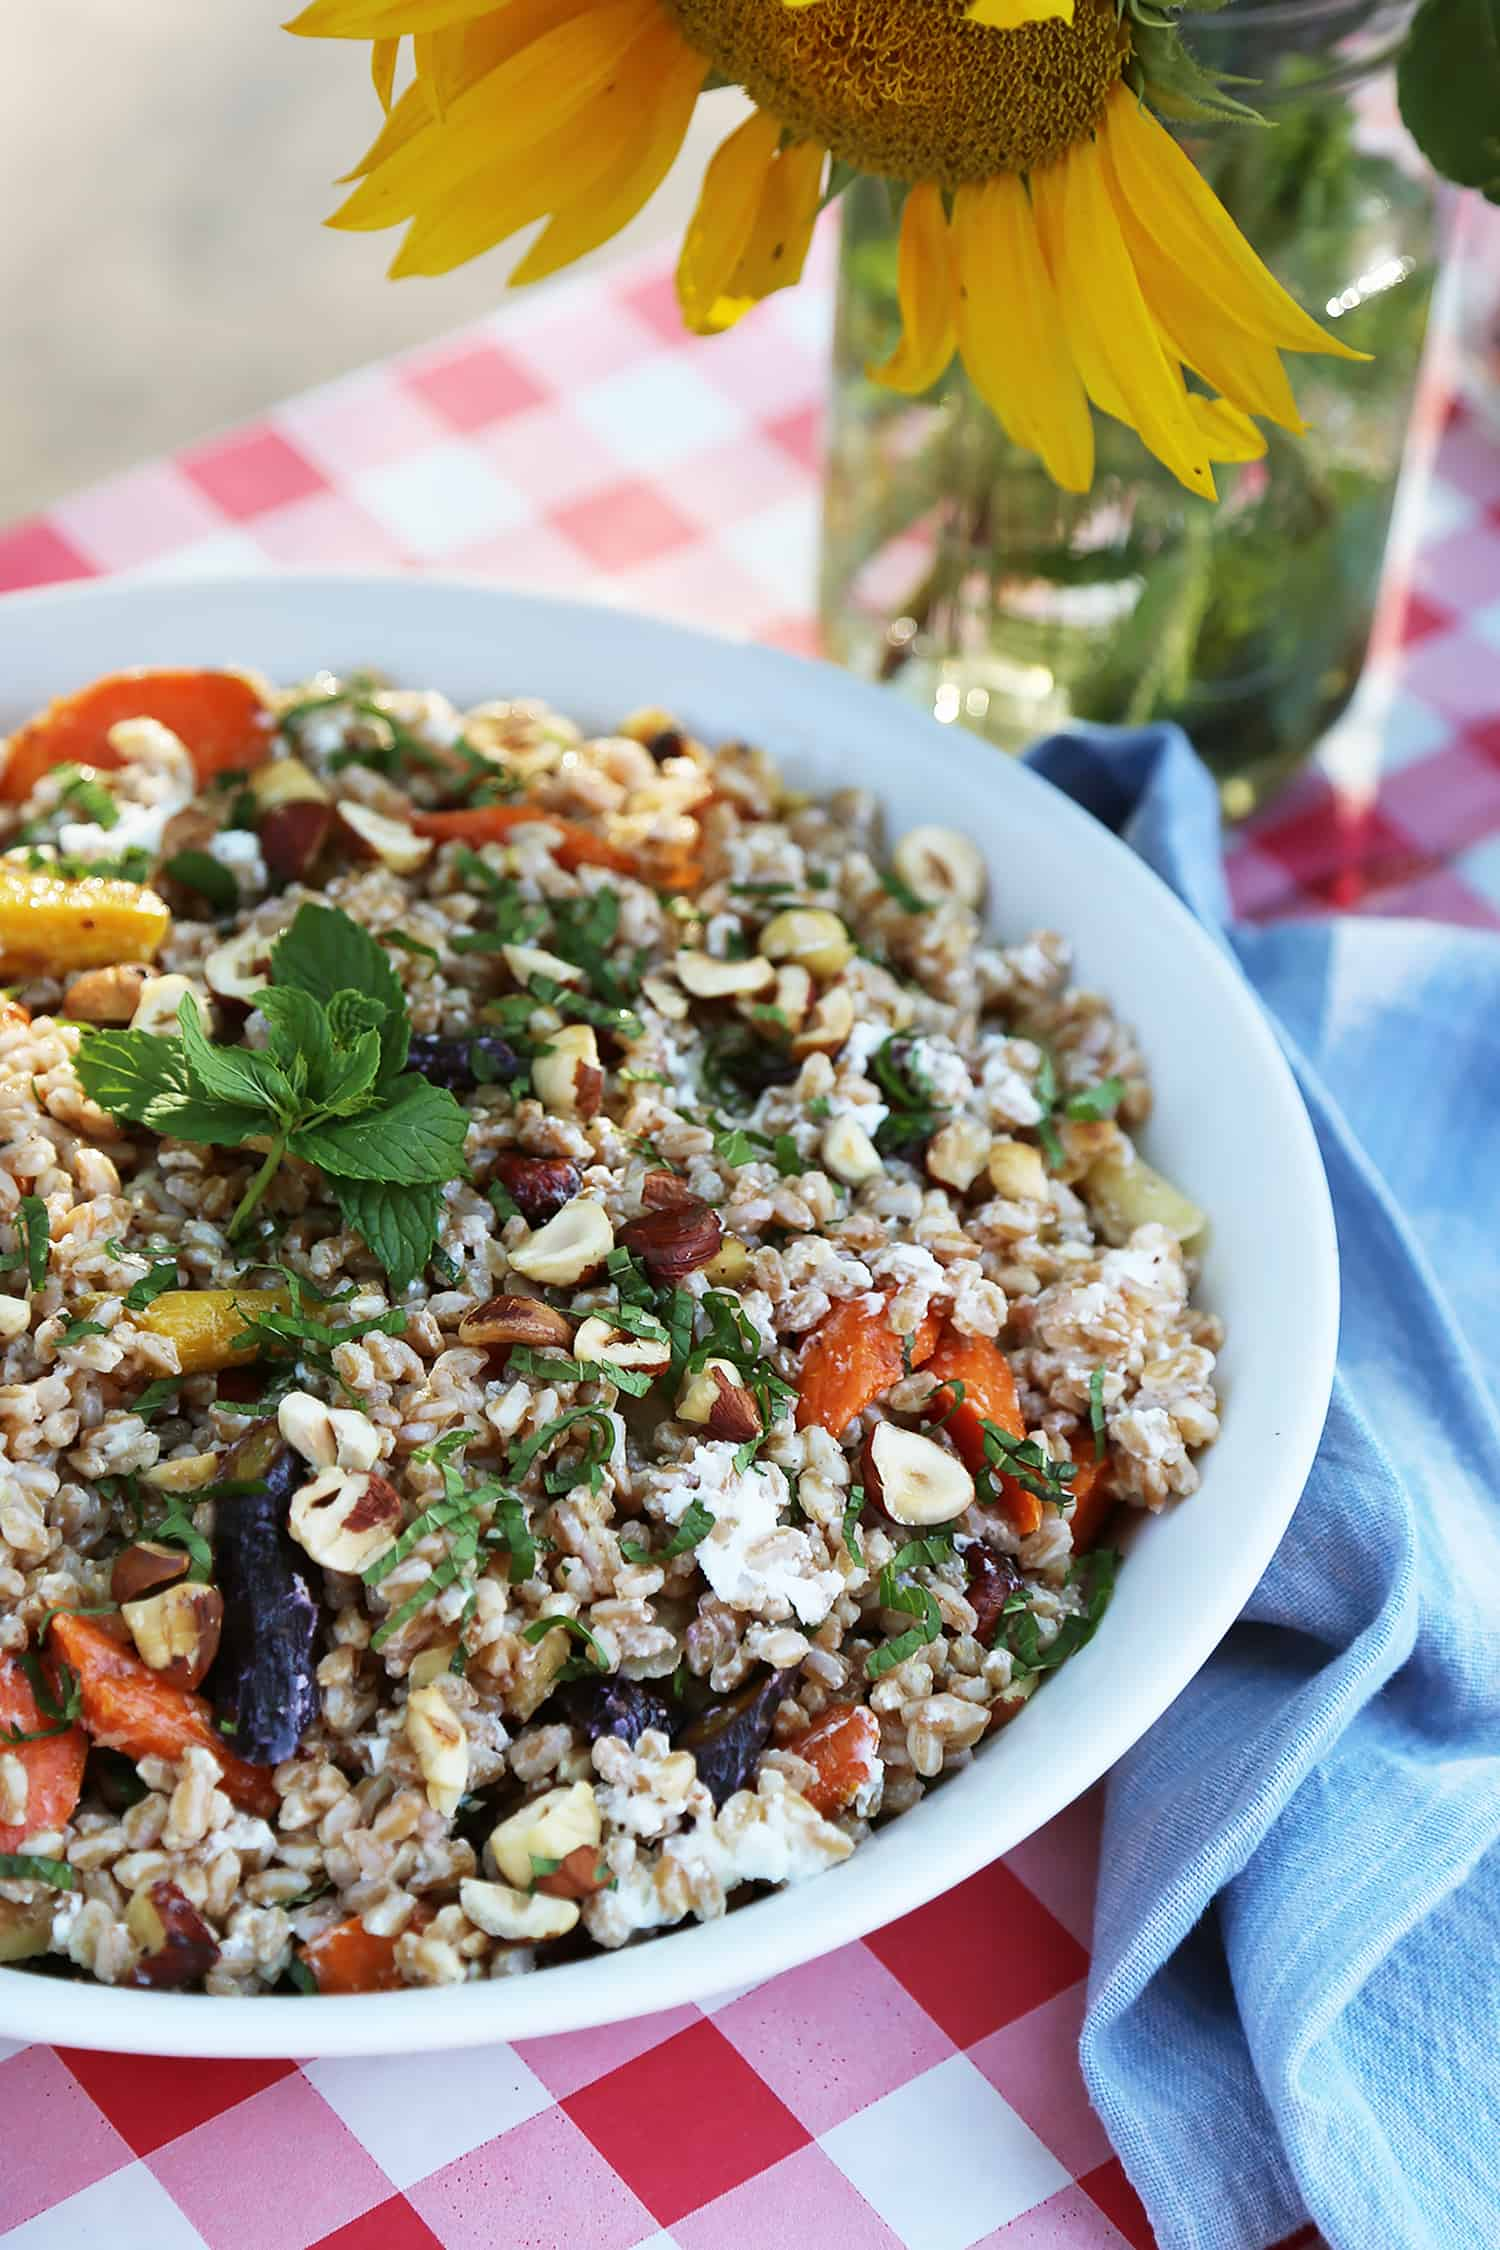 Farro with Roasted Carrots, Hazelnuts & Goat Cheese Recipe by Tiffani Thiessen